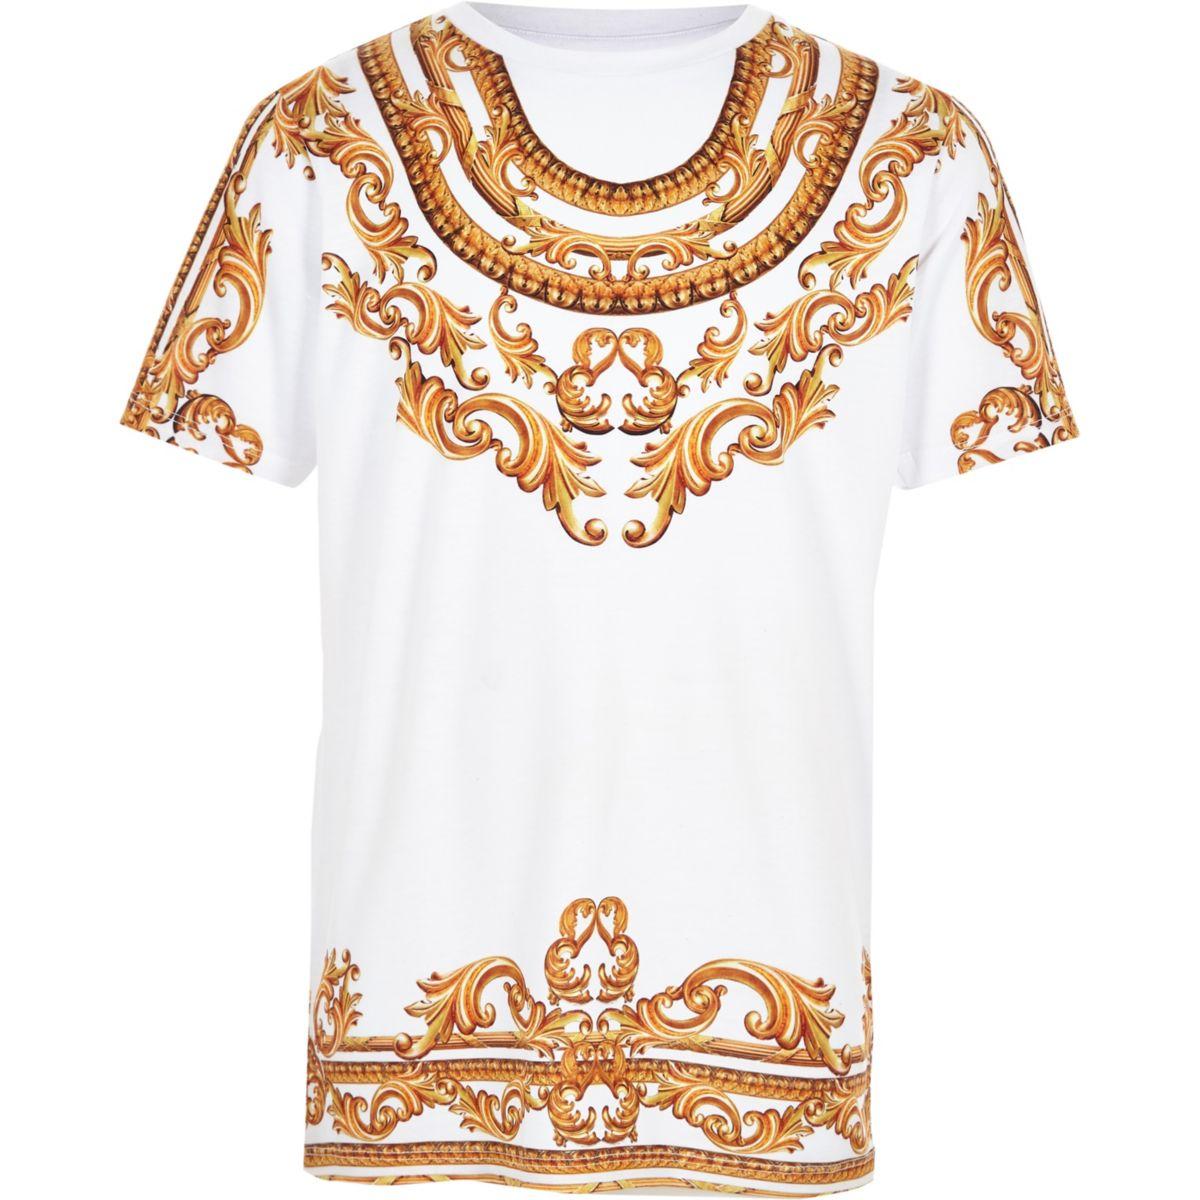 Boys white chain print T-shirt